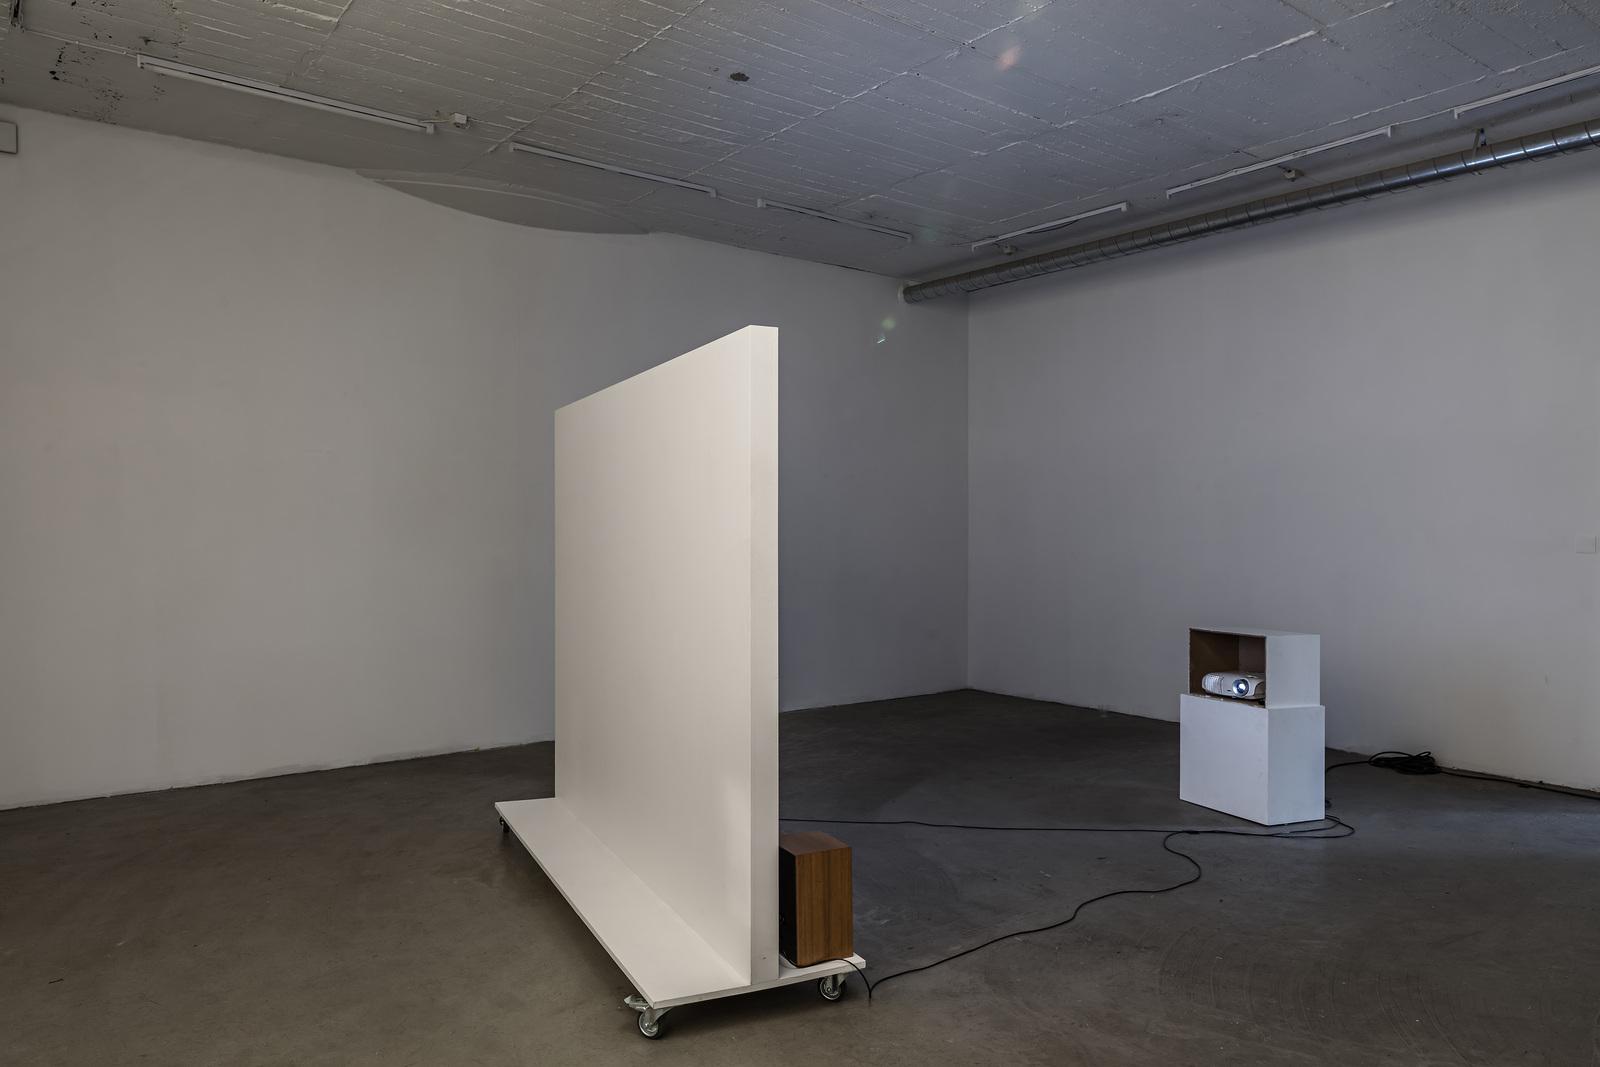 VI, VII-Benjamin Crotty at VI, VII-Exhibition view-Photograph by Vegard Kleven-Courtesy of VI, VII, Oslo_VK_2736